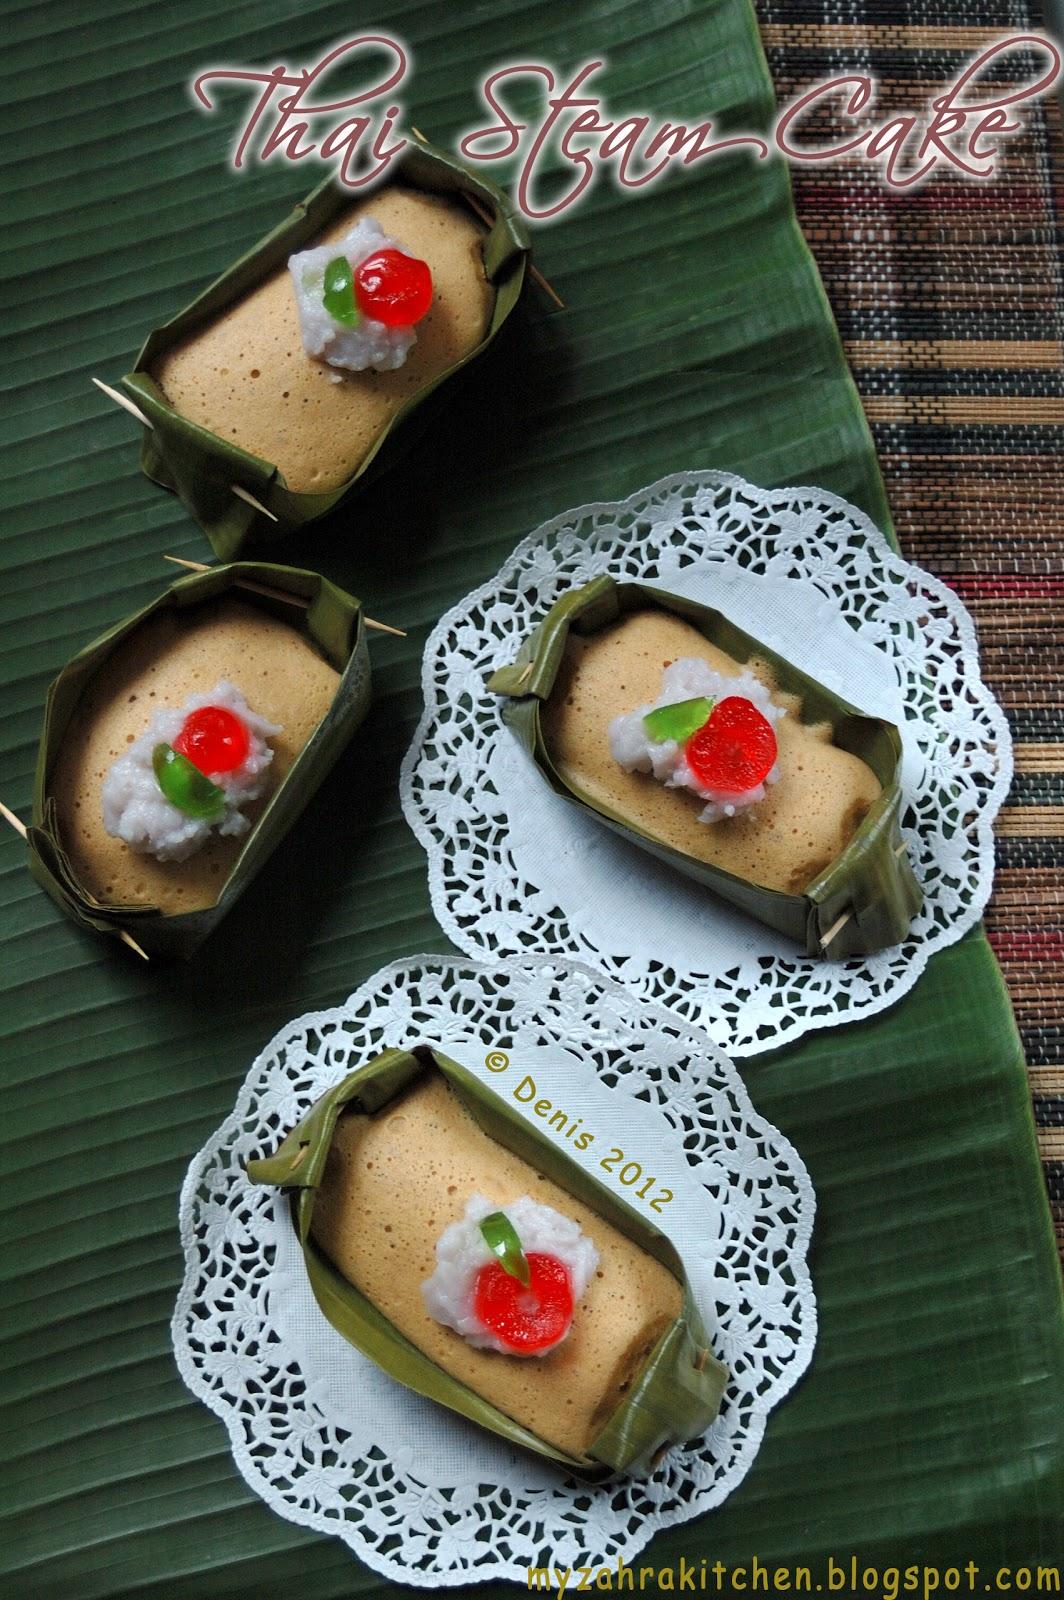 1064 x 1600 · 461 kB · jpeg, Thai Steam Cake